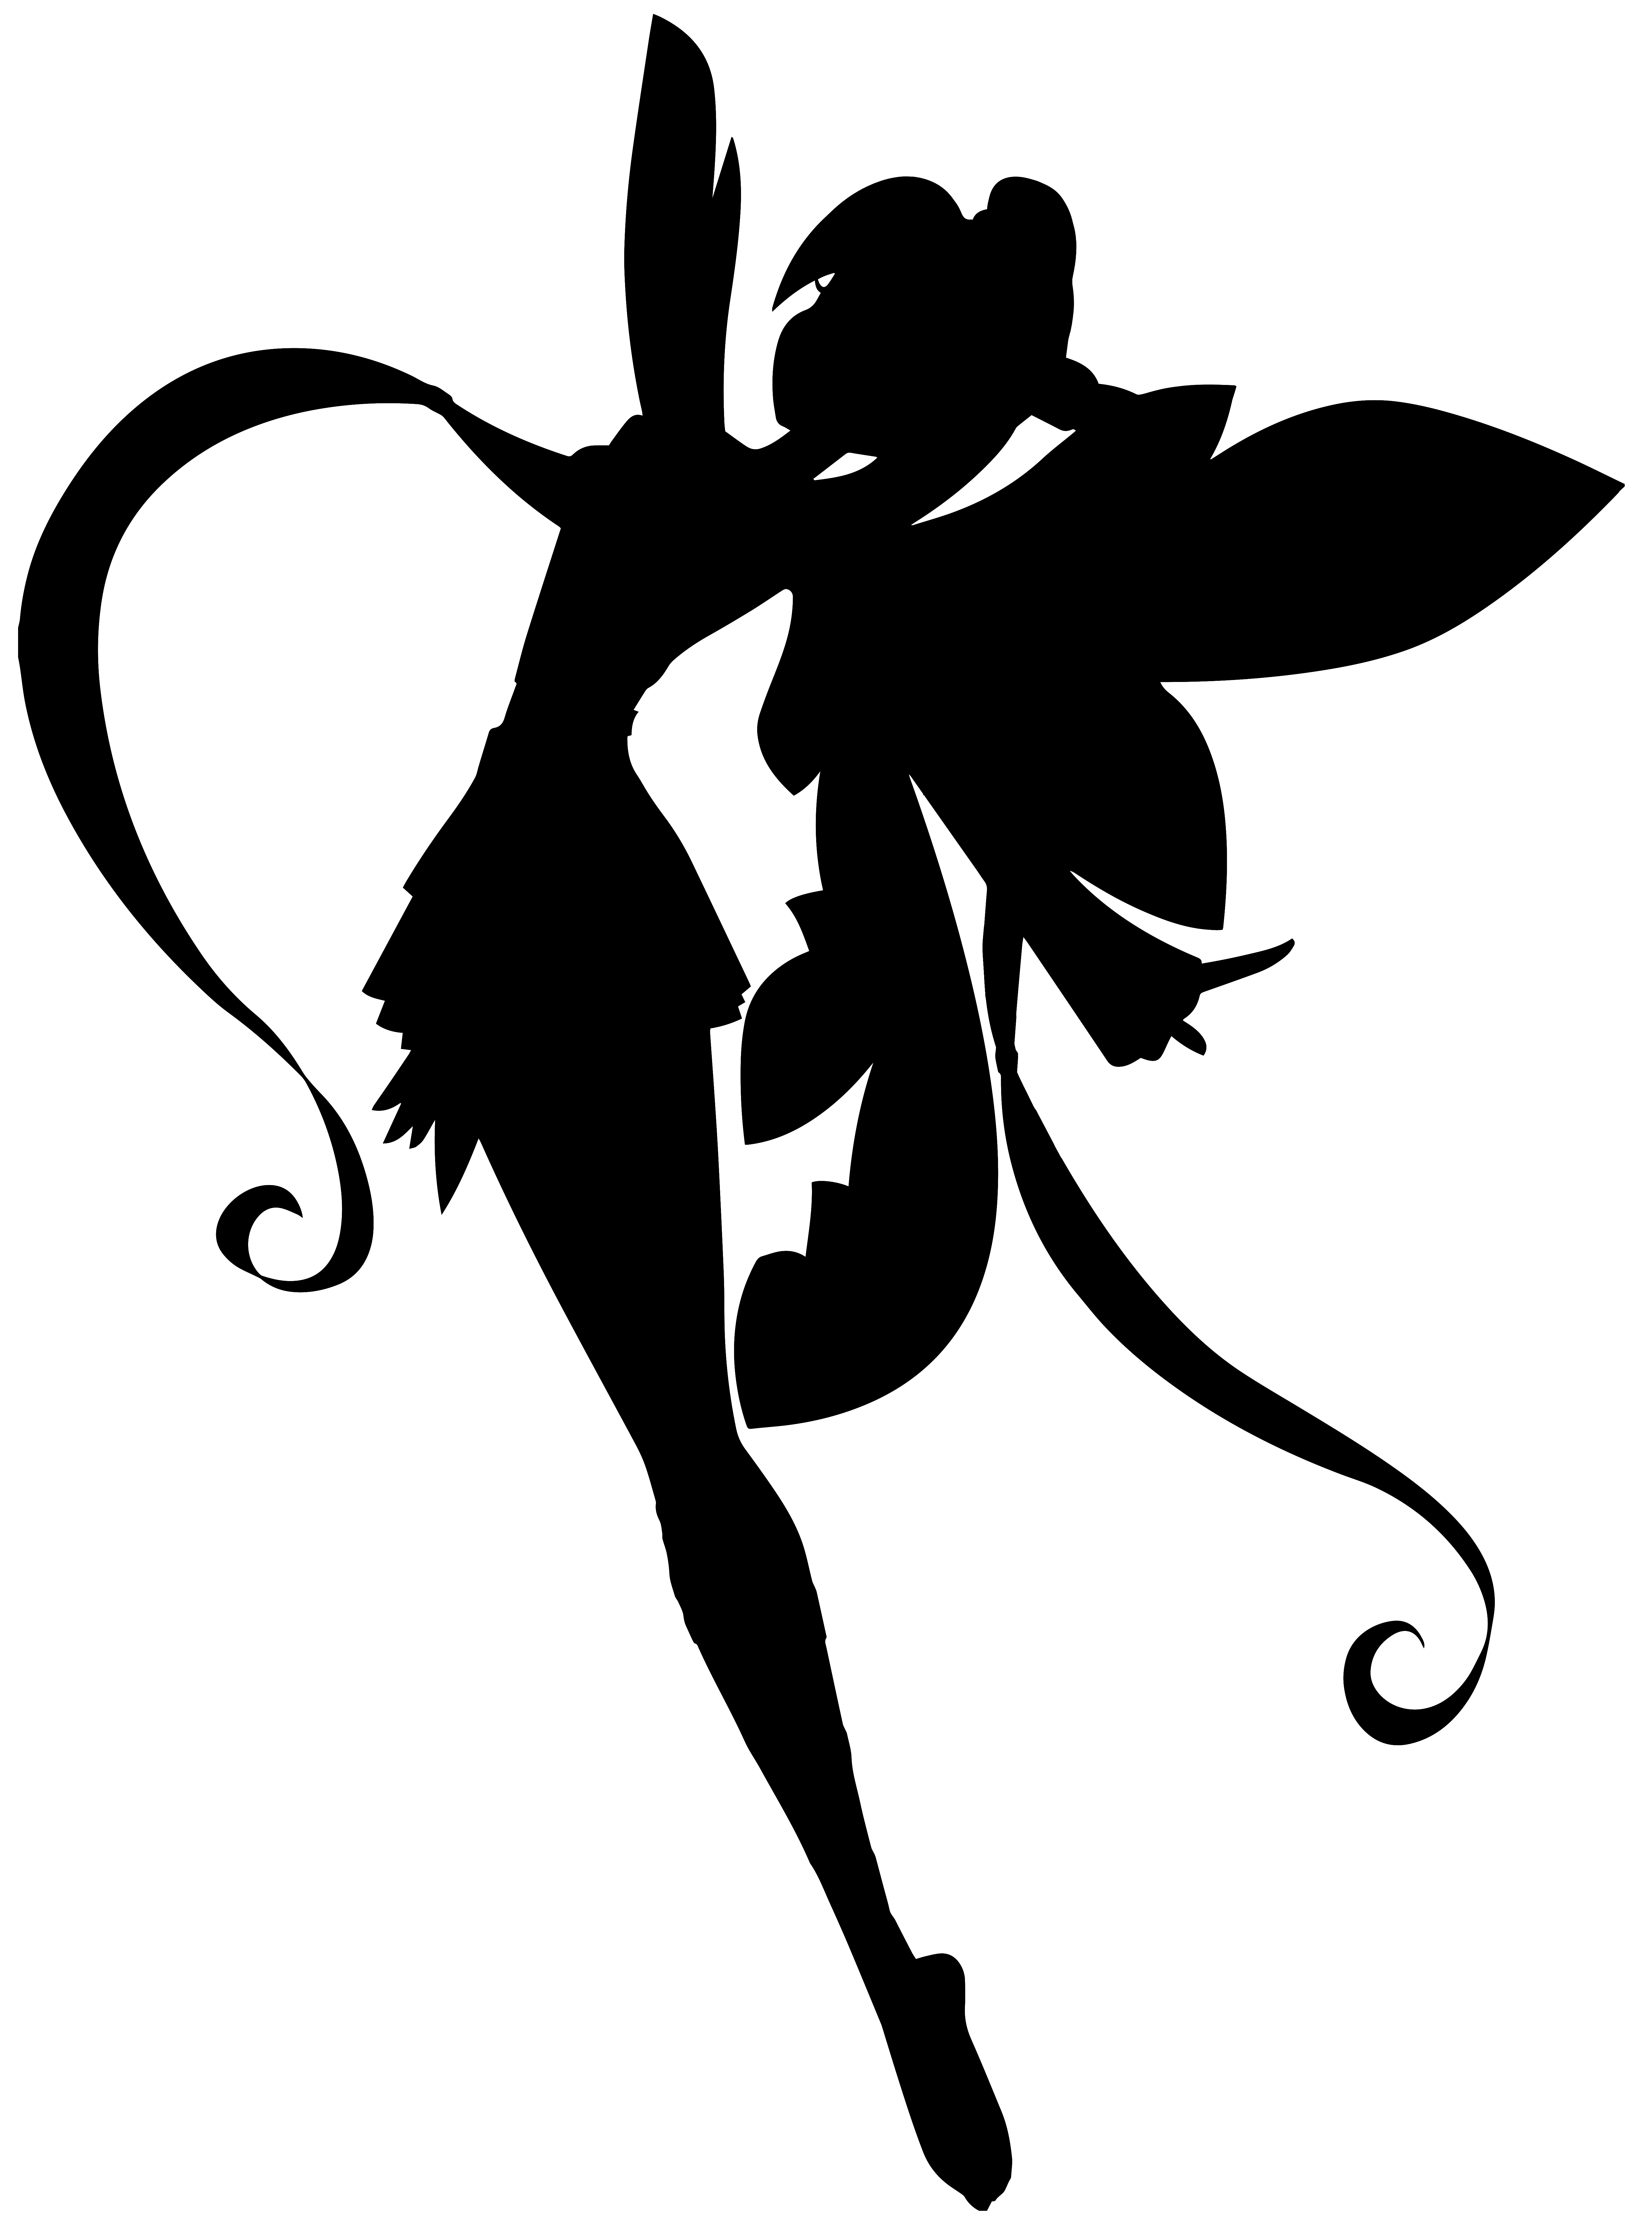 Fairy transparent clip art. Spiderweb clipart silhouette